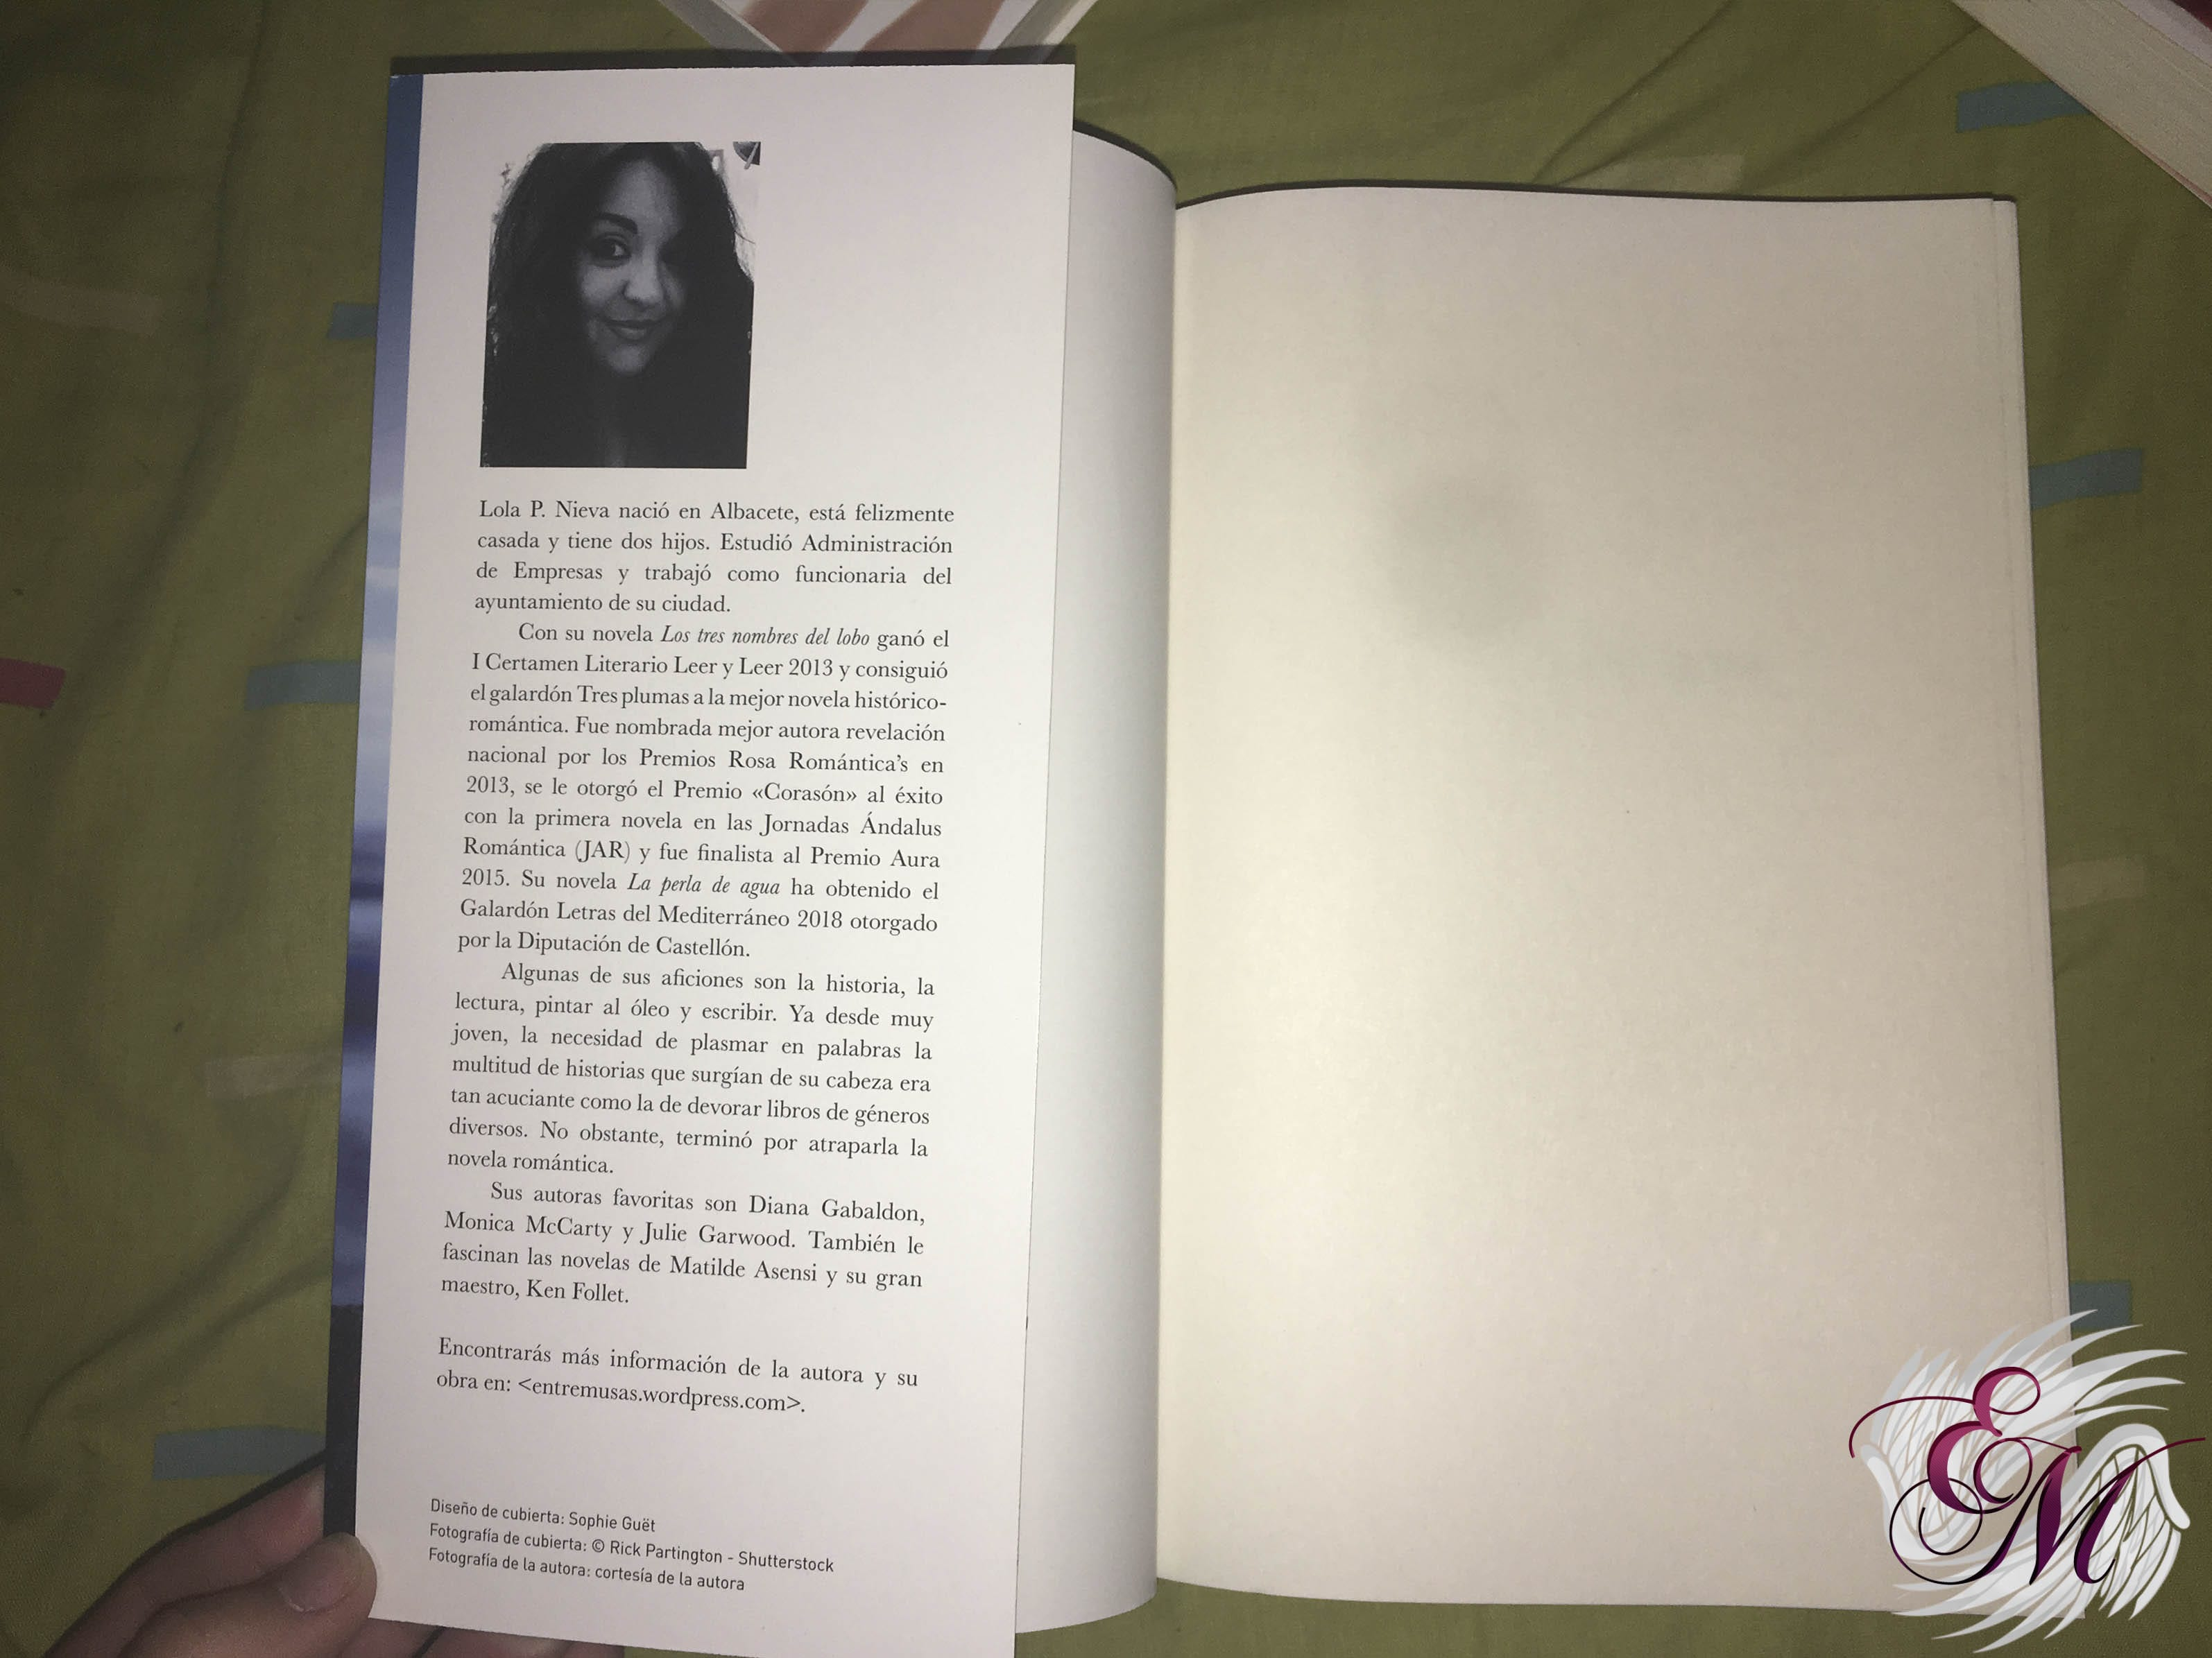 La perla del agua, de Lola P Nieva - Reseña